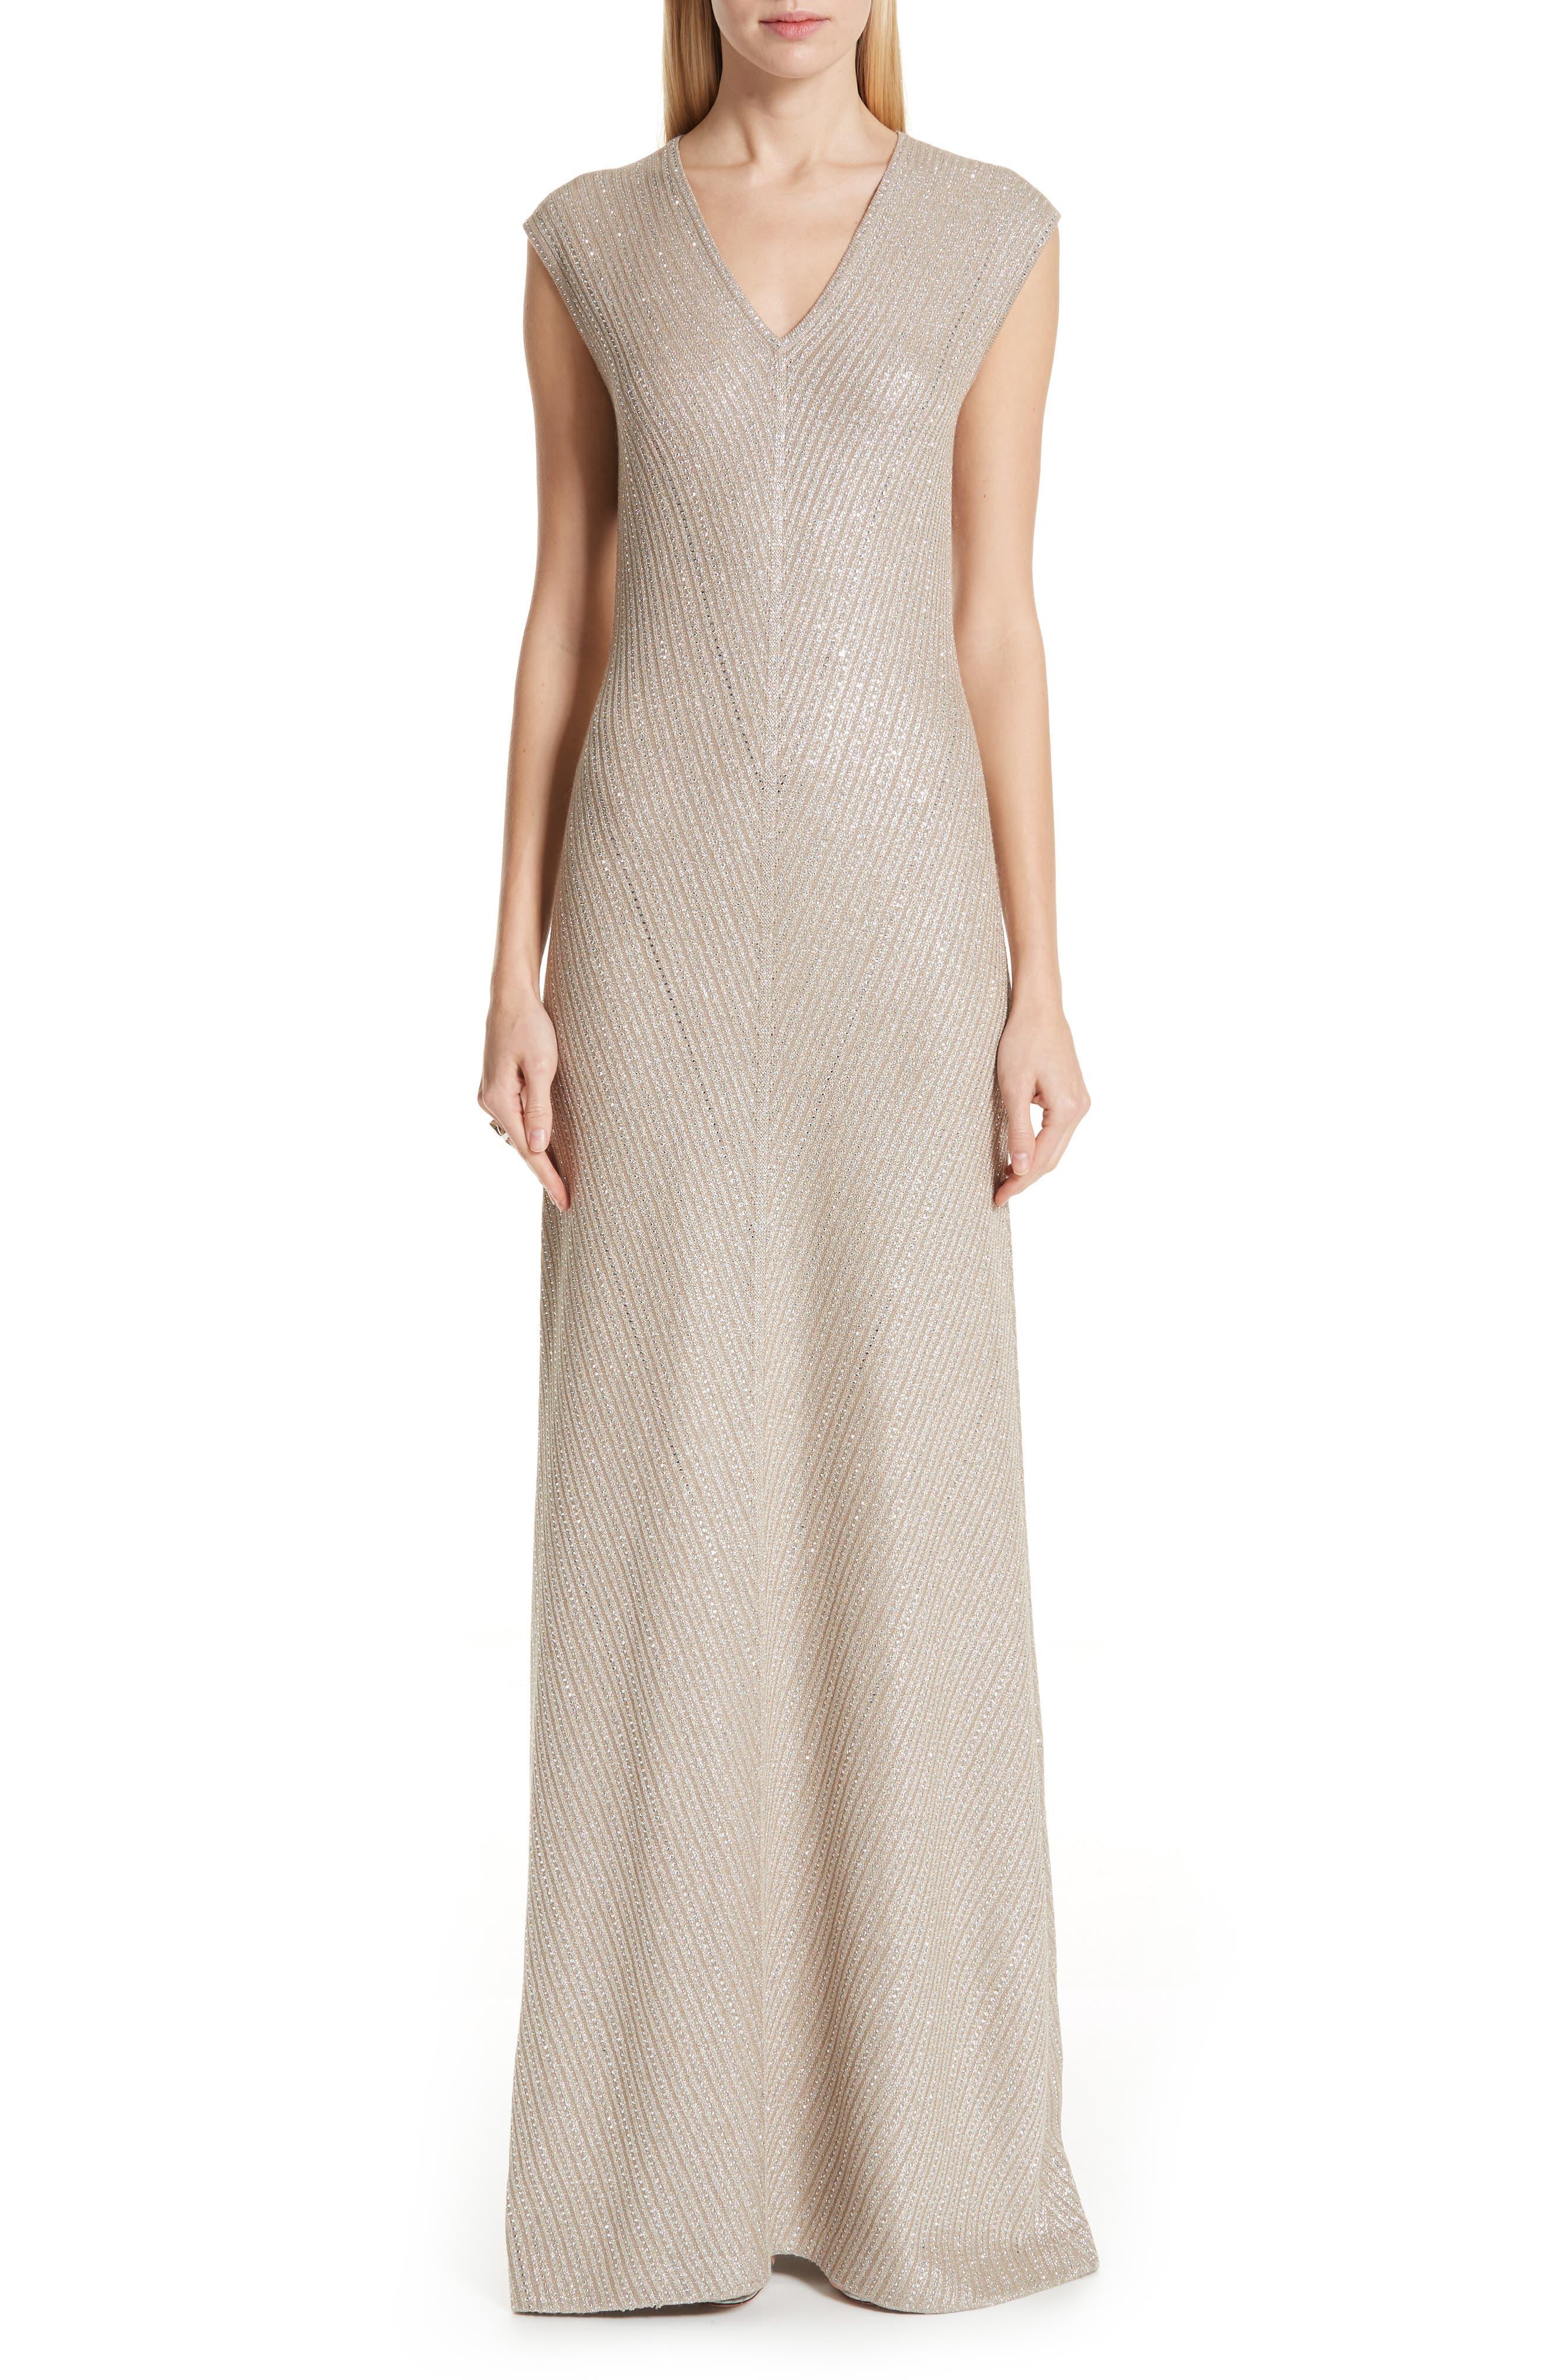 ST. JOHN COLLECTION, Brielle Knit V-Neck Gown, Main thumbnail 1, color, DARK KHAKI/ GOLD